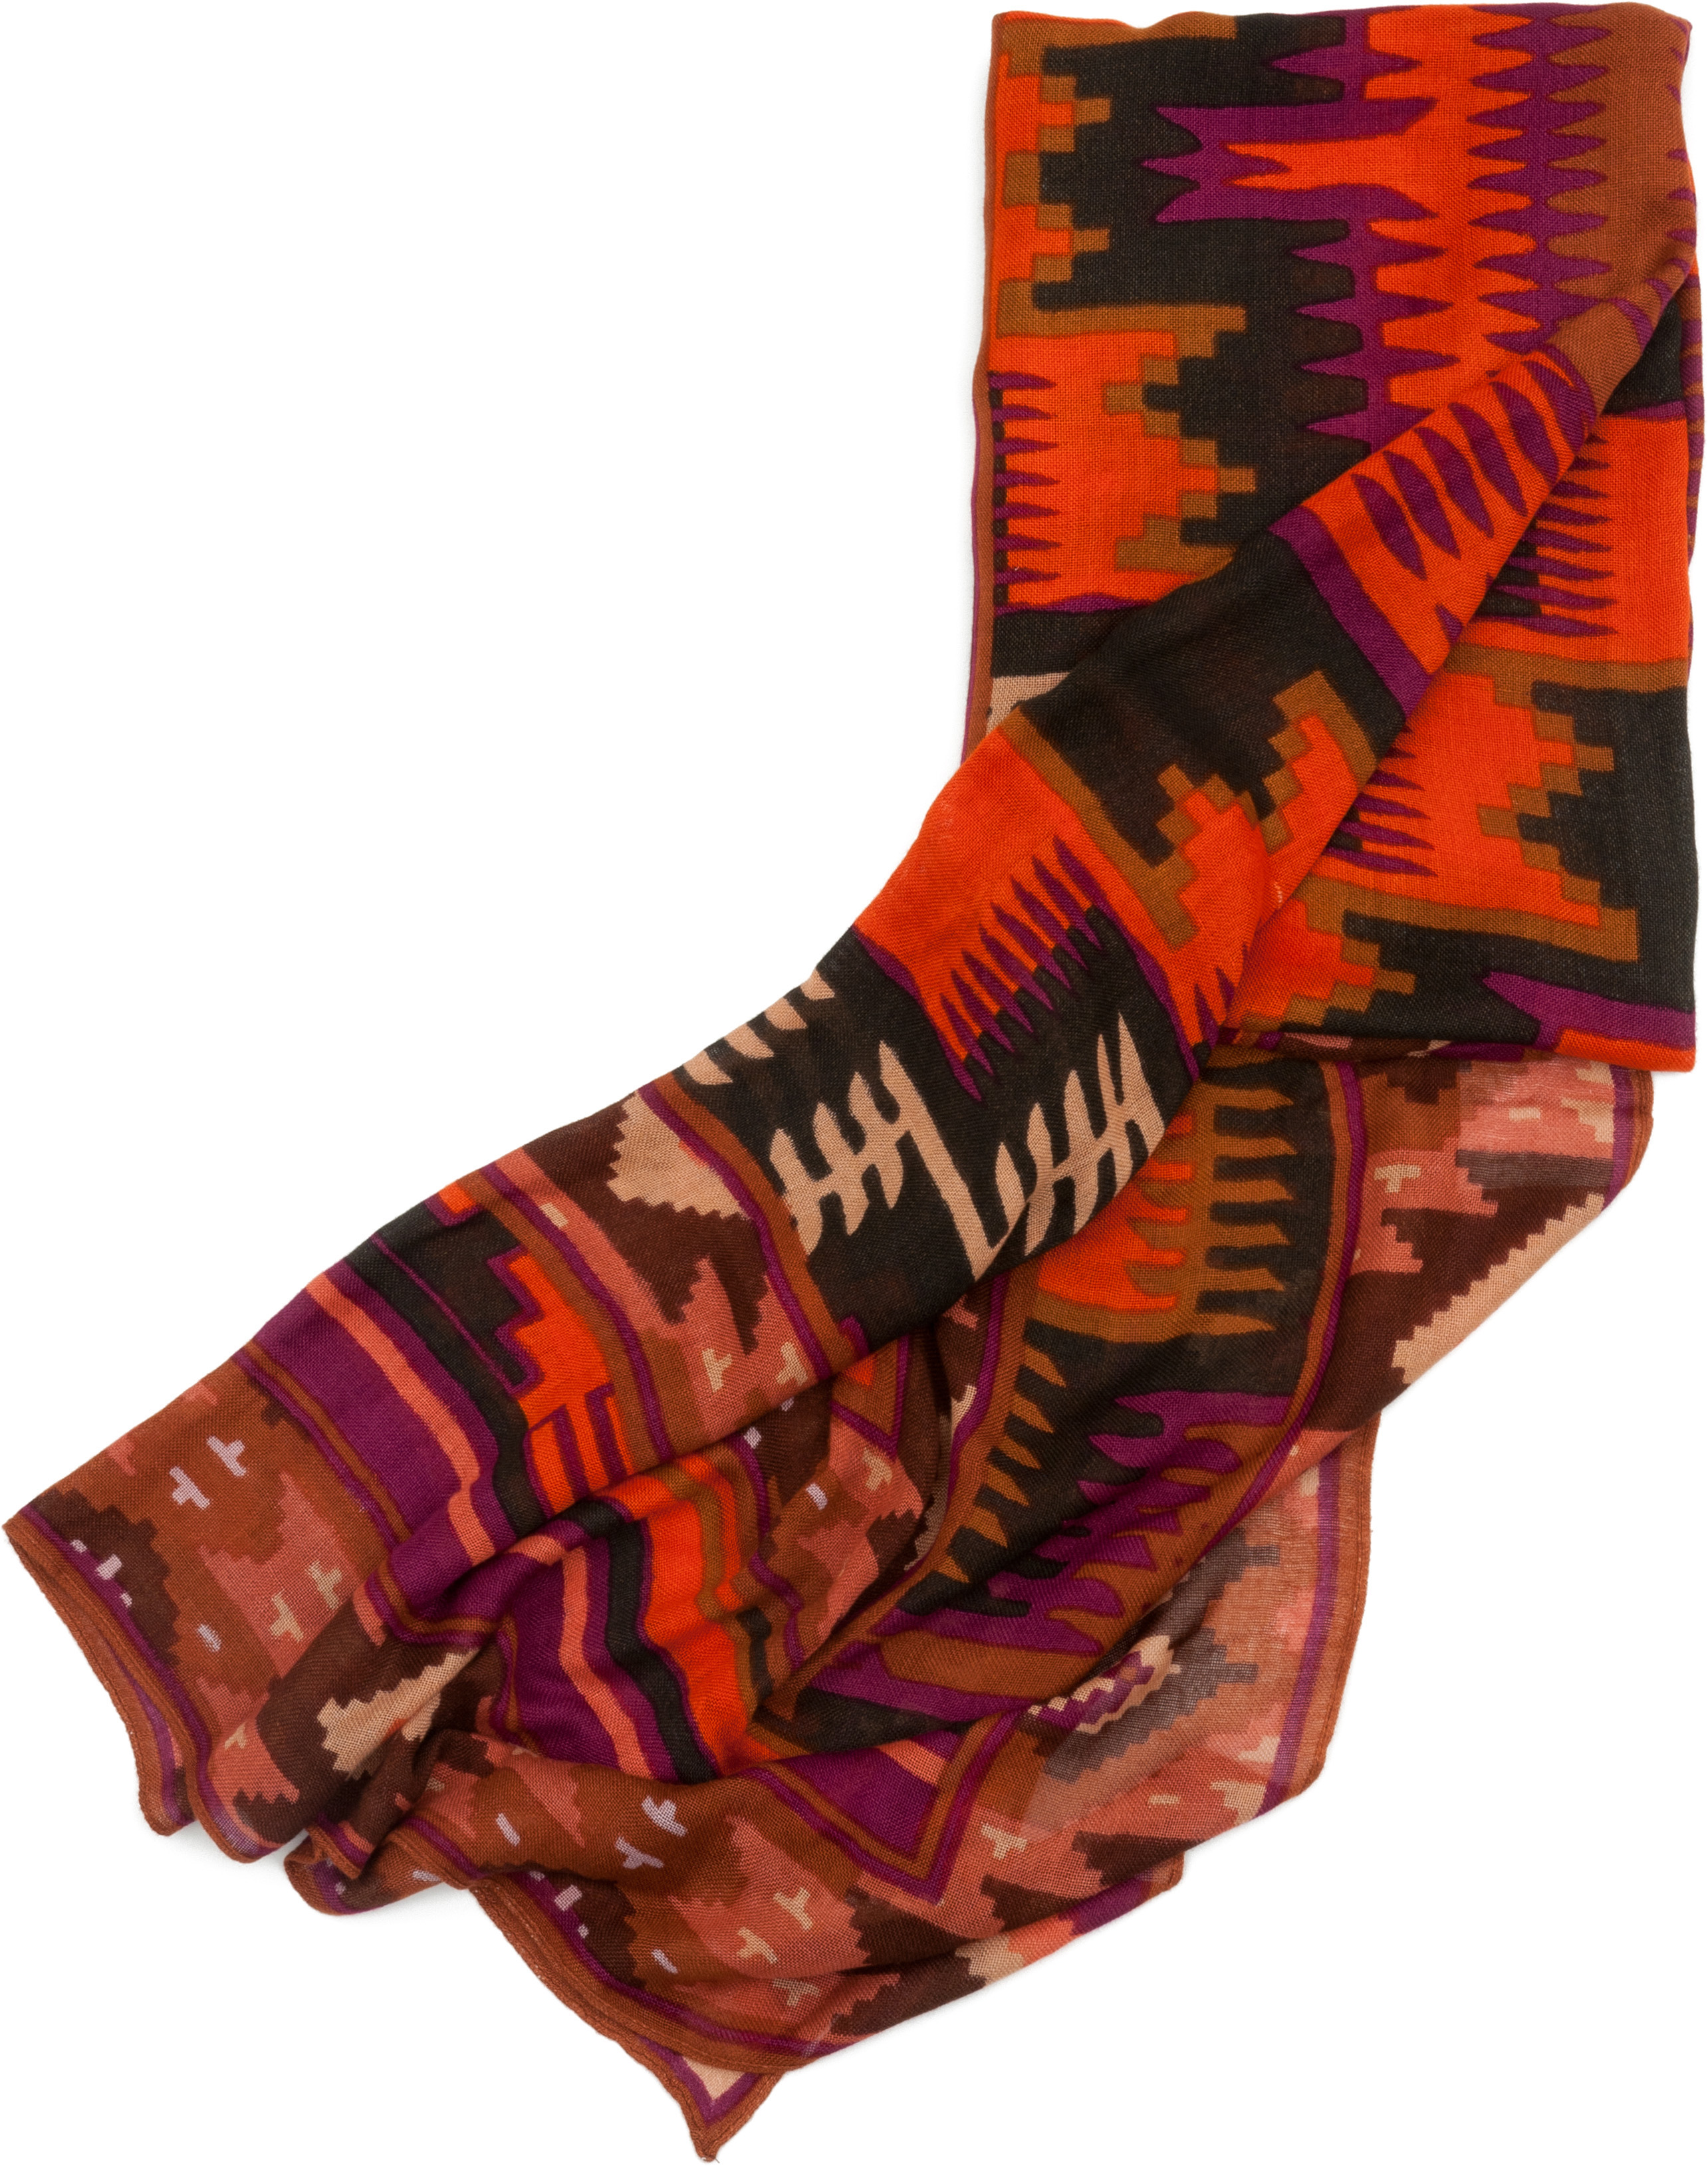 Theodora-&-Callum-scarf-gift